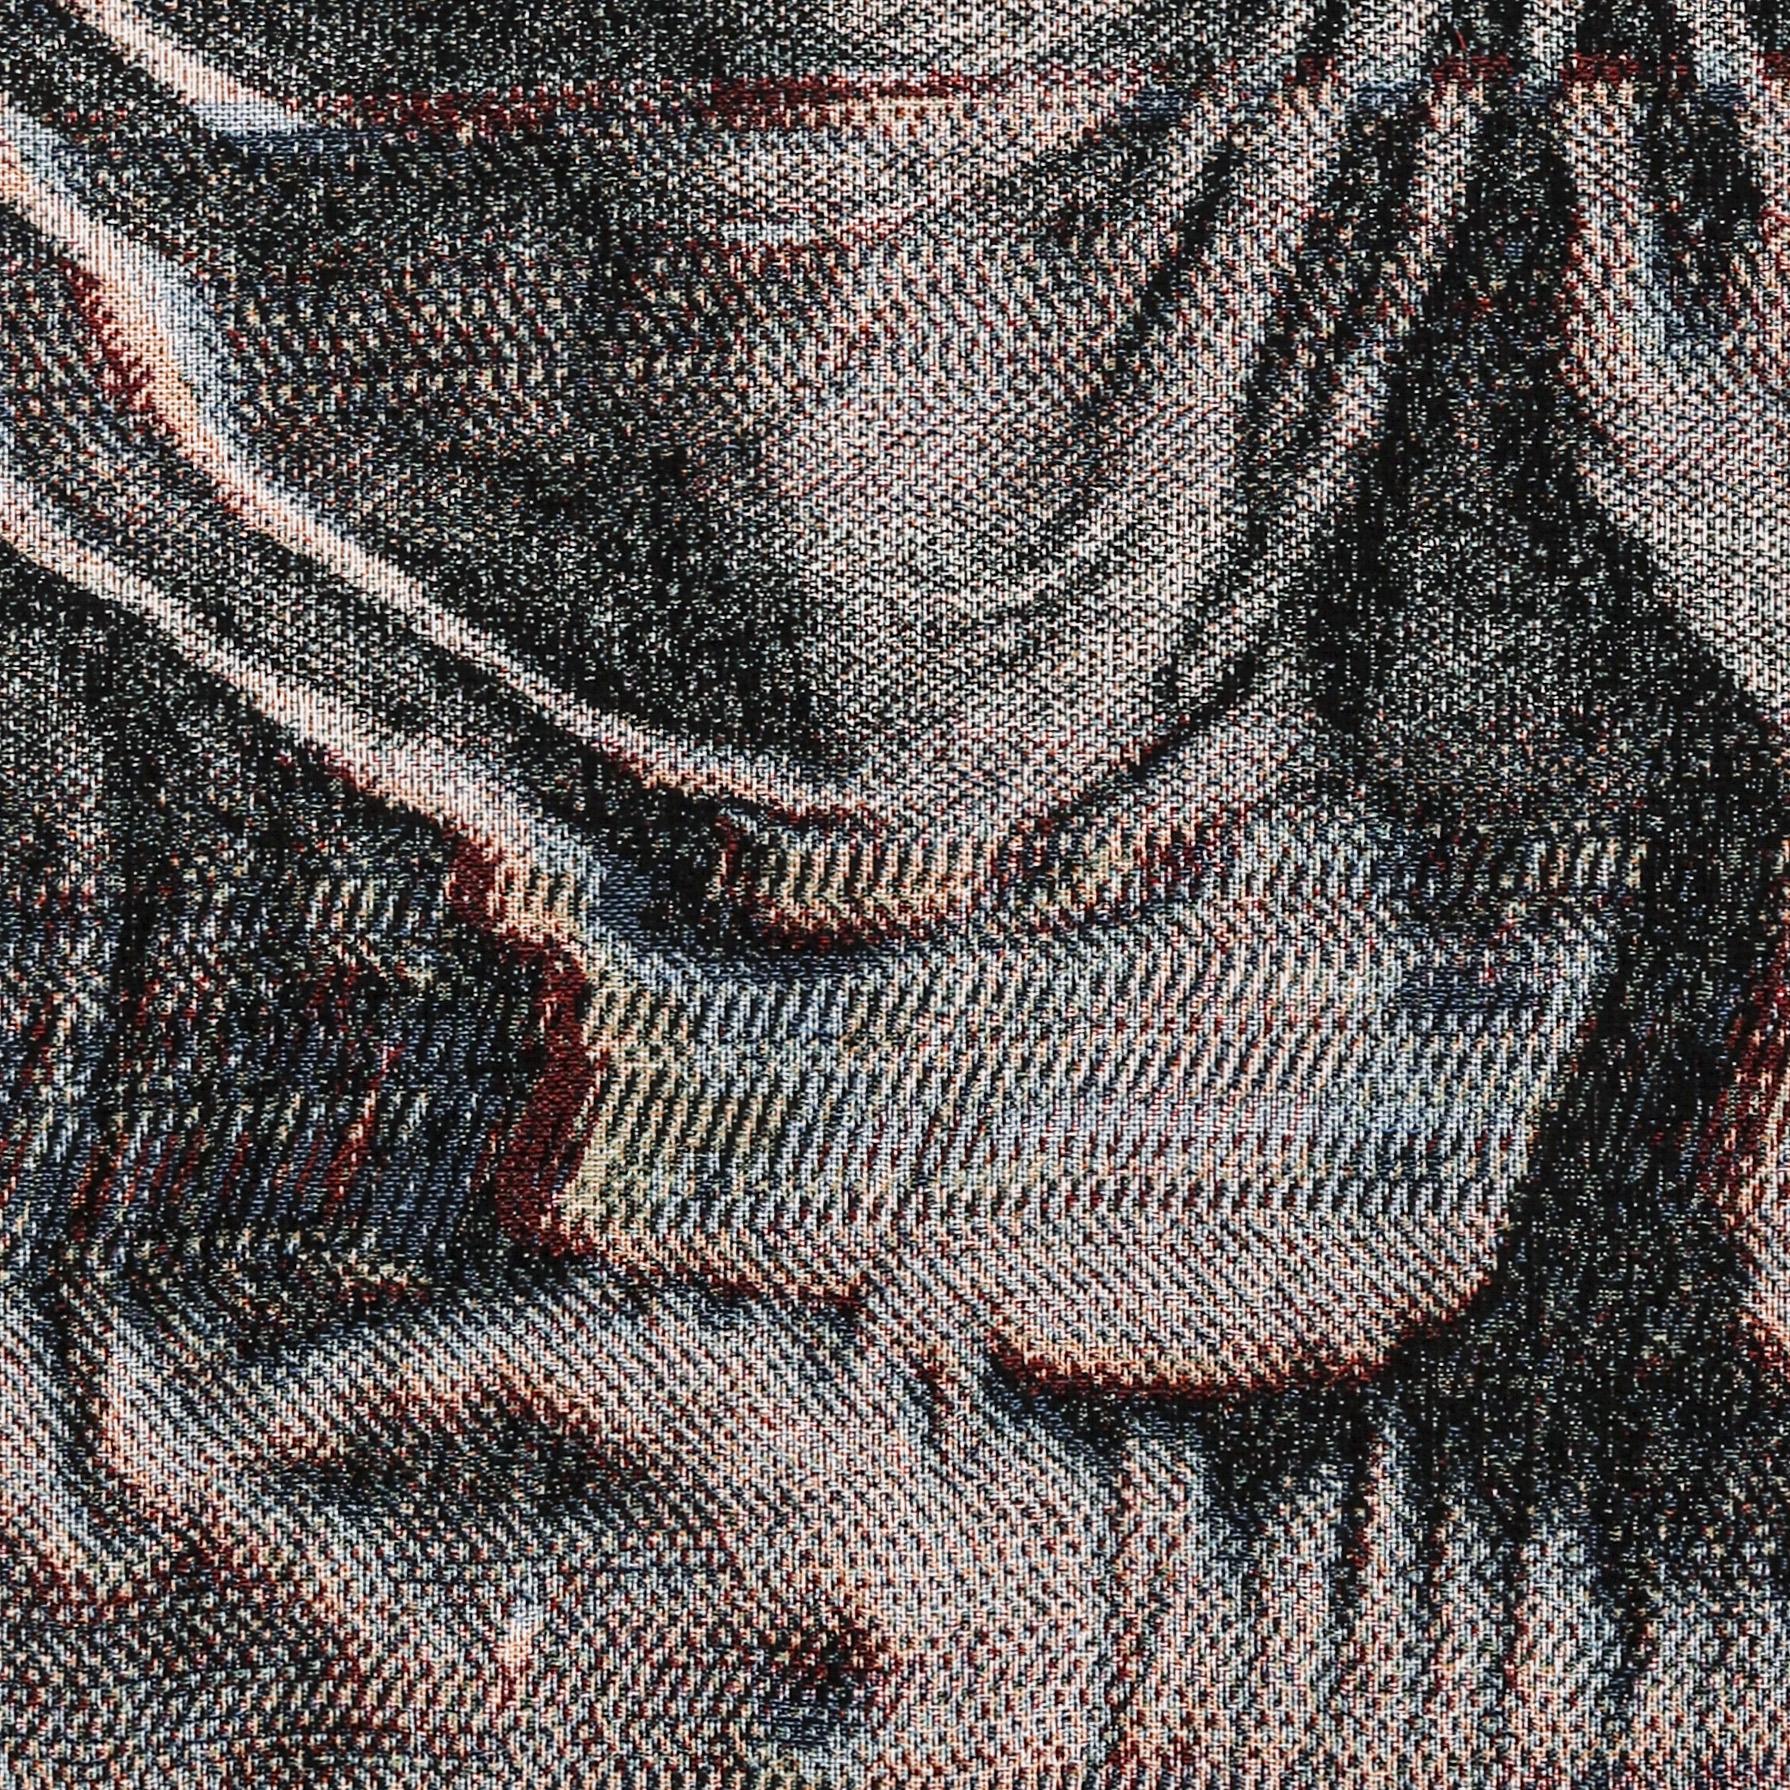 Henrikson_Brett_2019_Textile Detail No.1.jpg